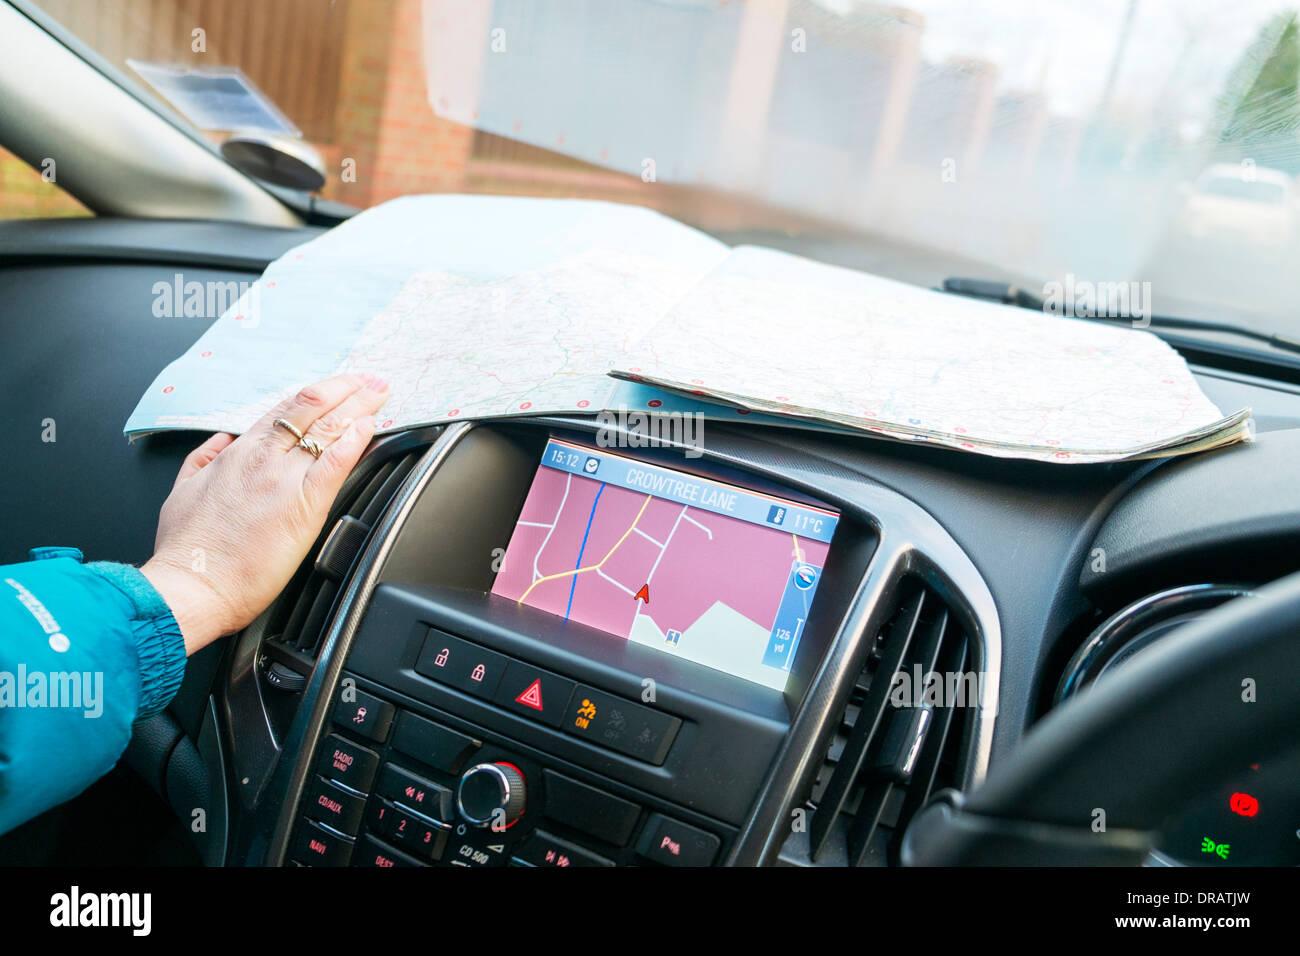 map versus sat nav satnav navigation print technology satellite navigation best better quicker route find finding quickest - Stock Image